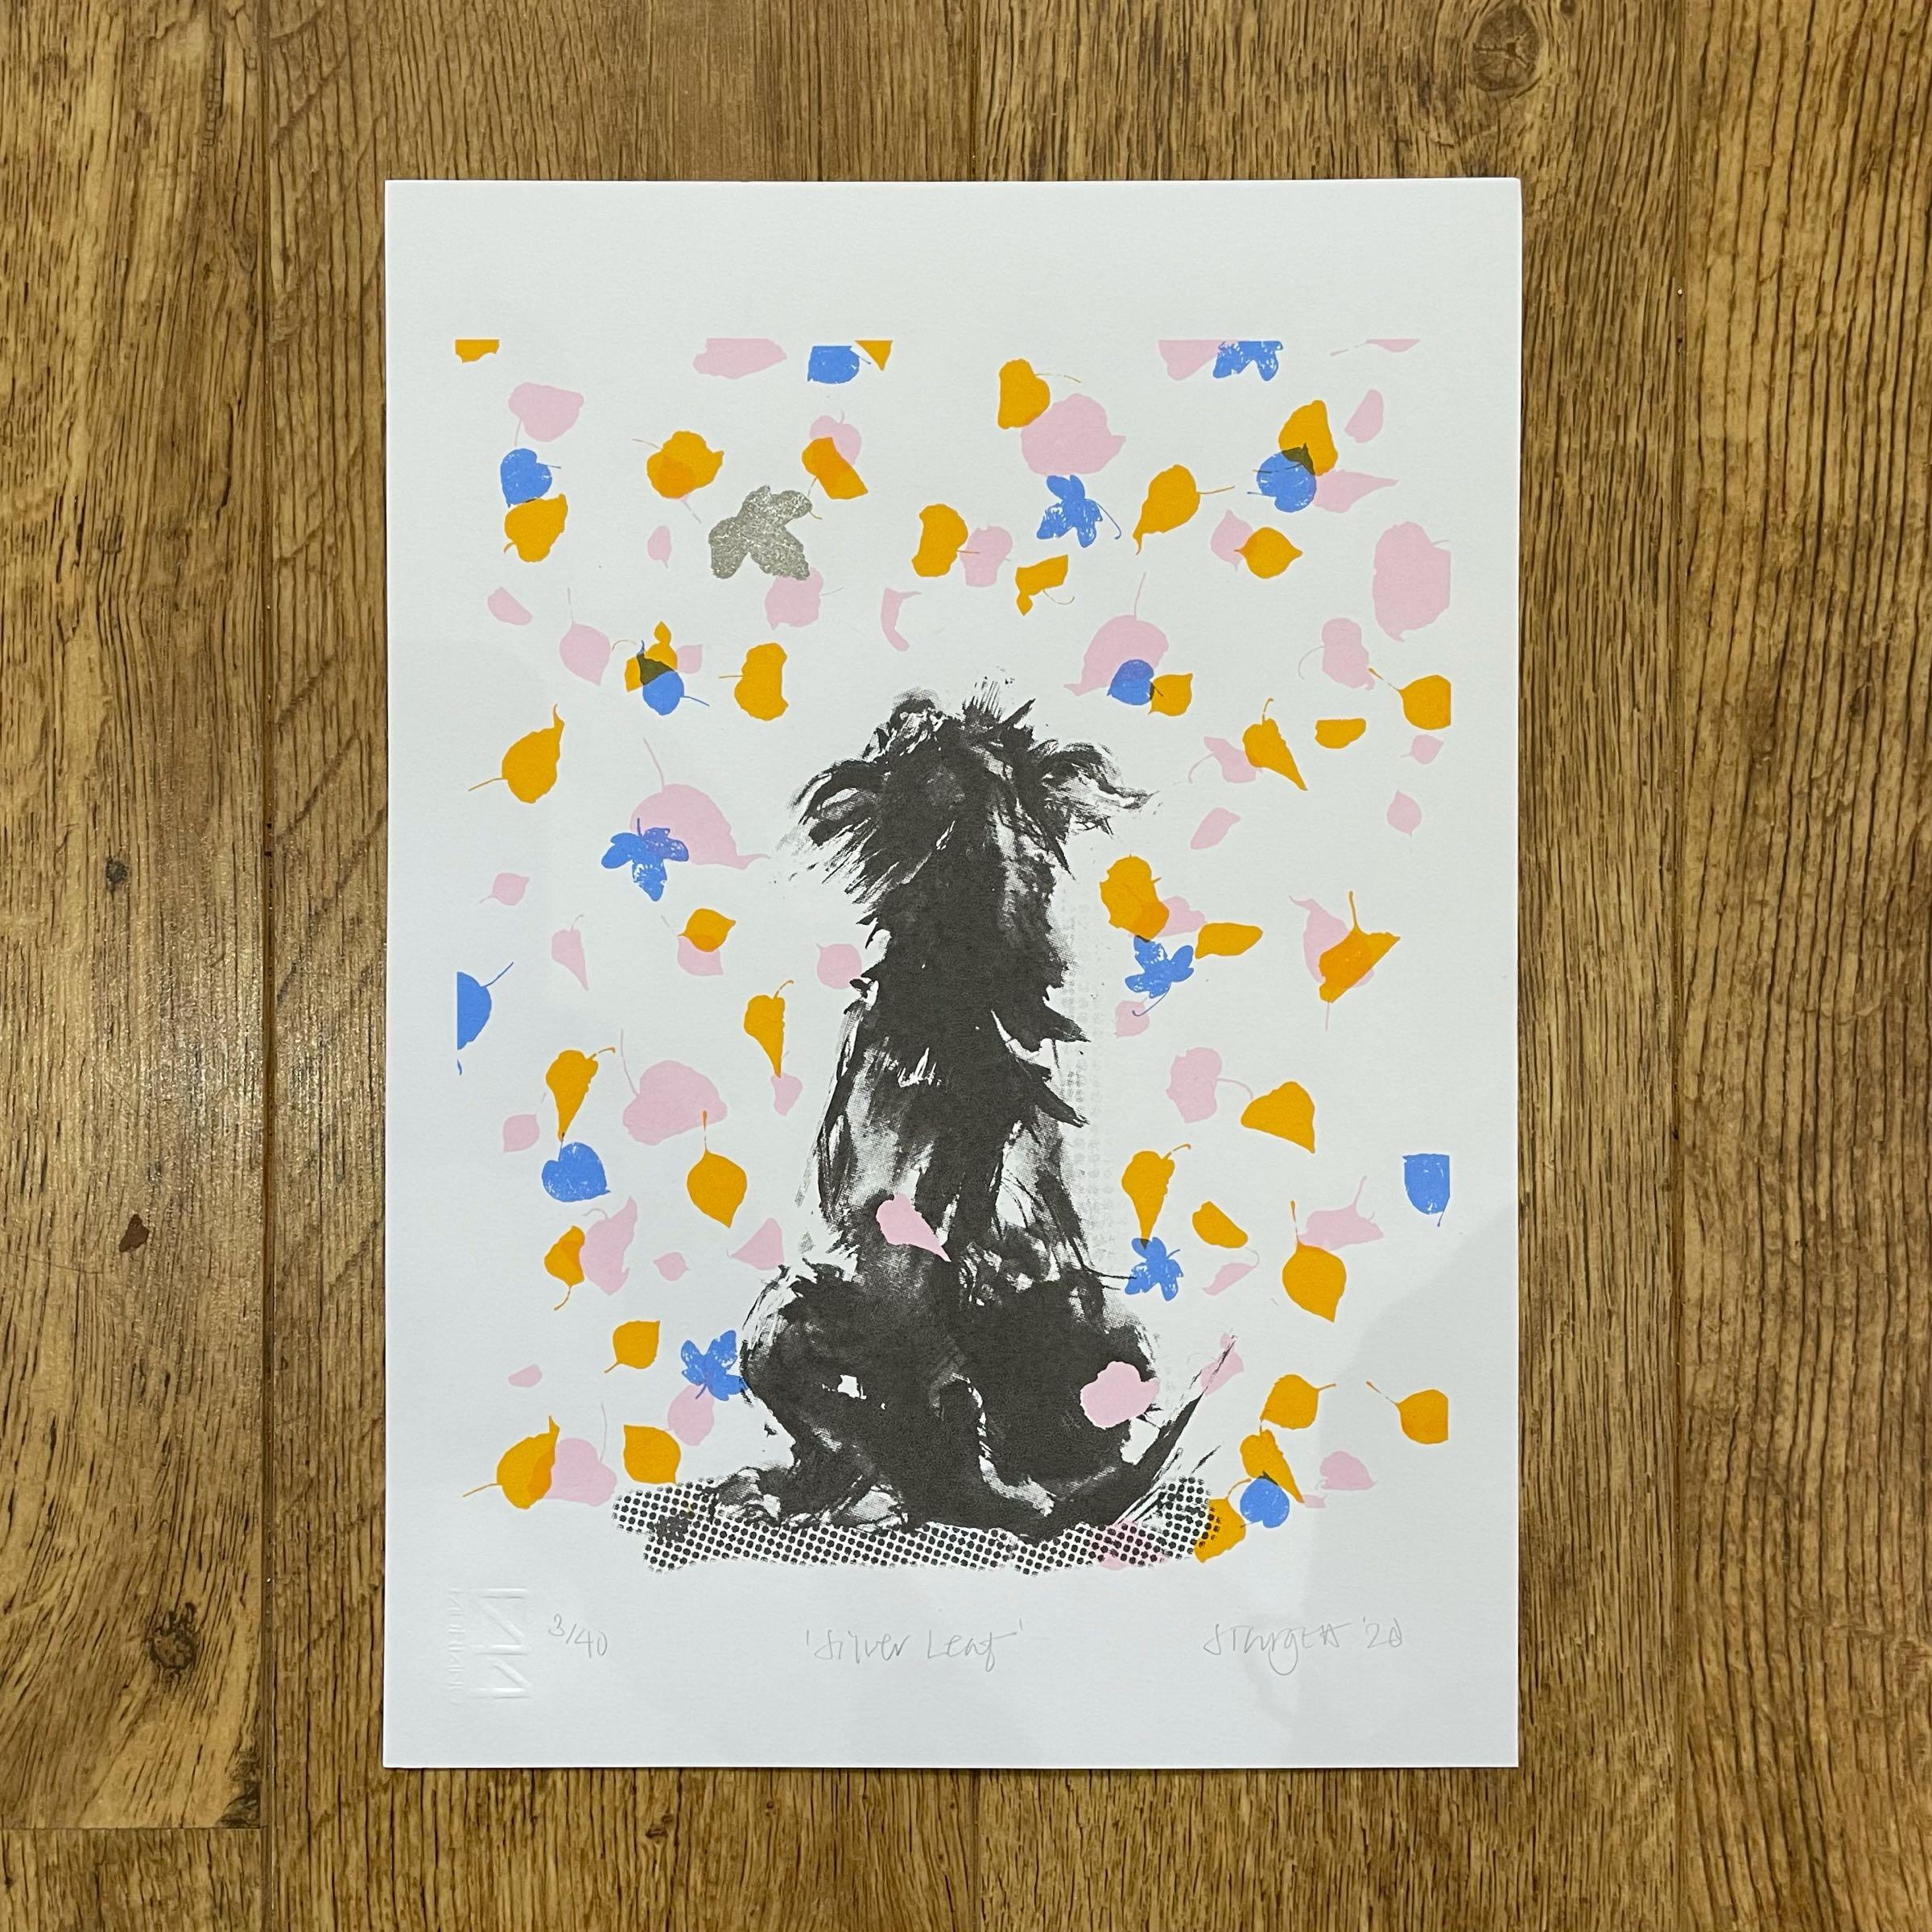 'Silver Leaf', Silkscreen print by Sarah Targett